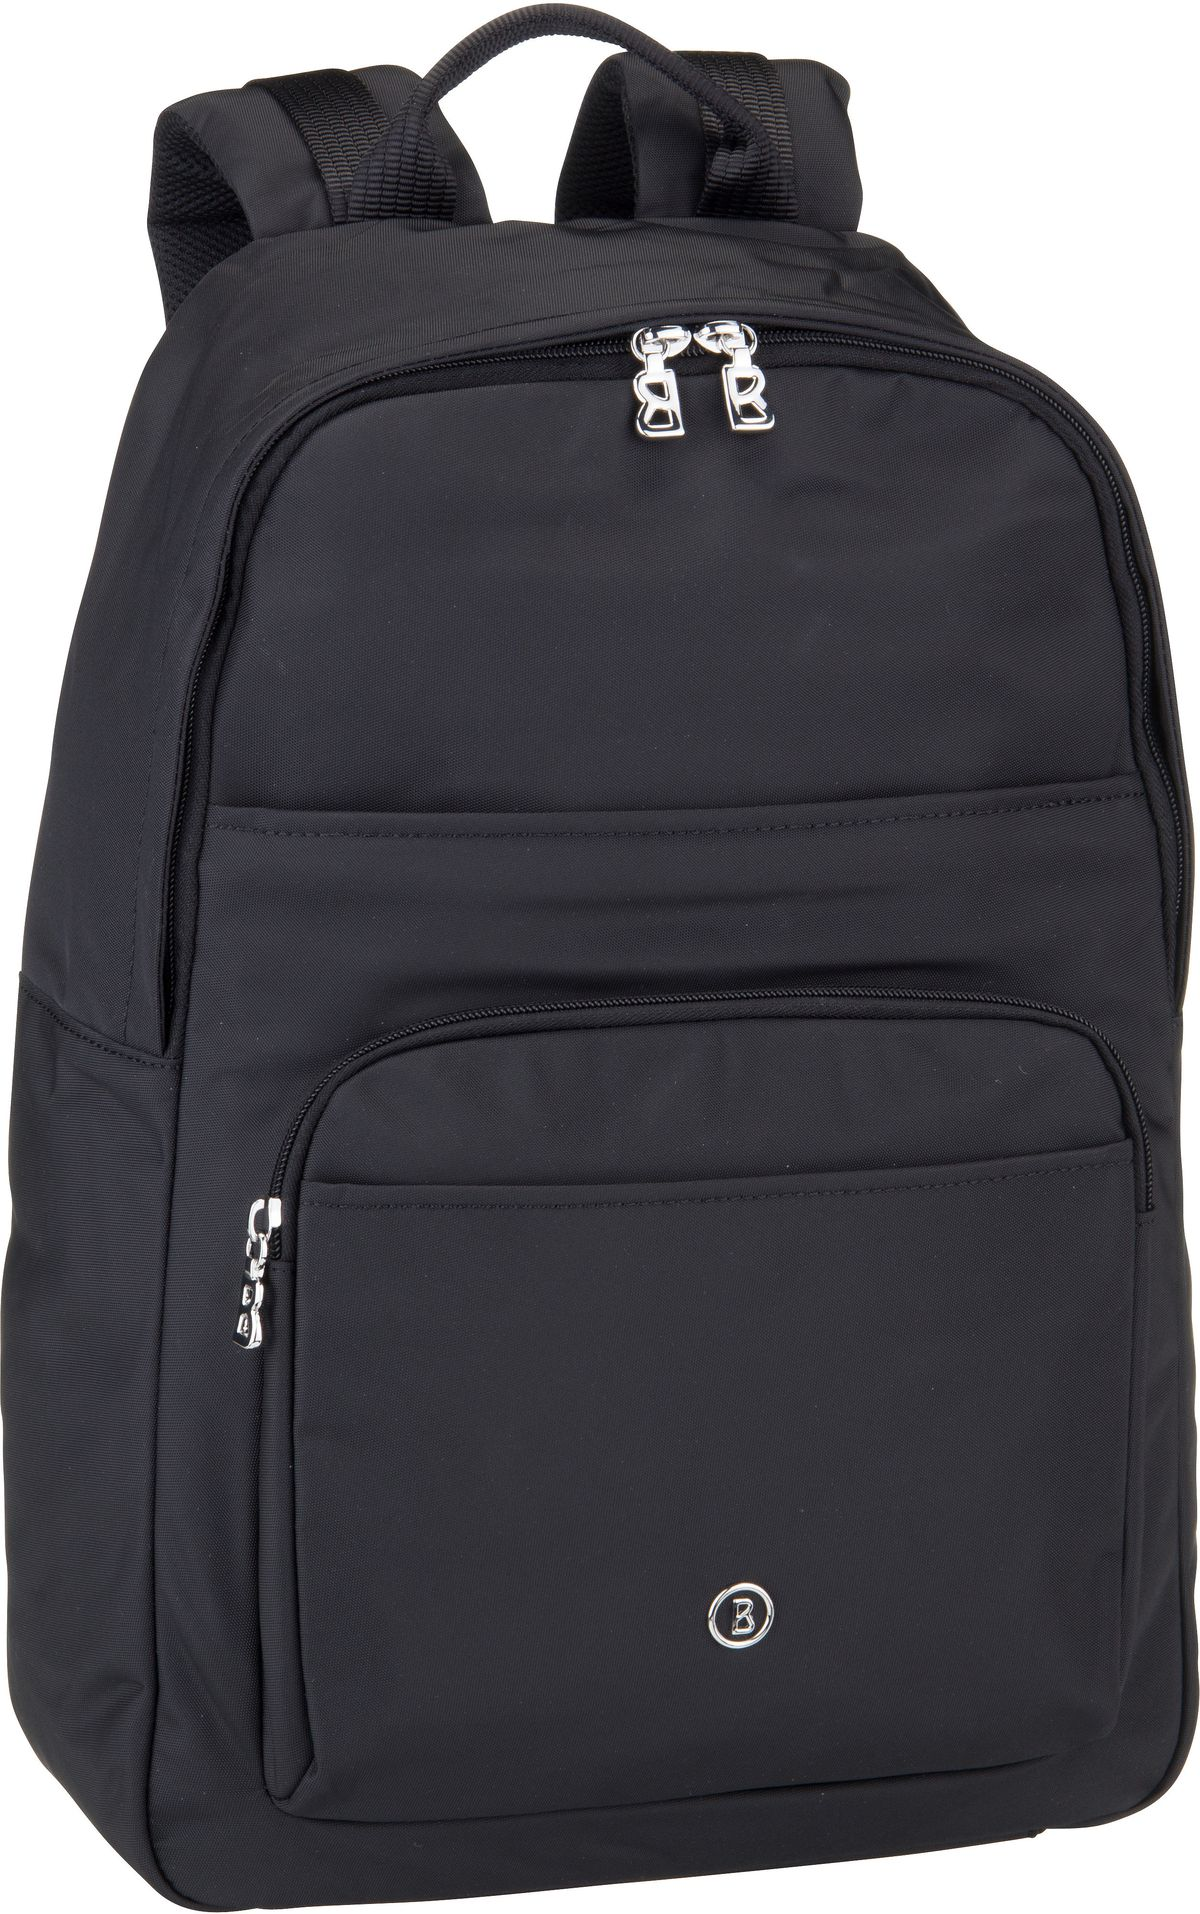 Rucksack / Daypack Verbier Henri BackPack MVZ Black